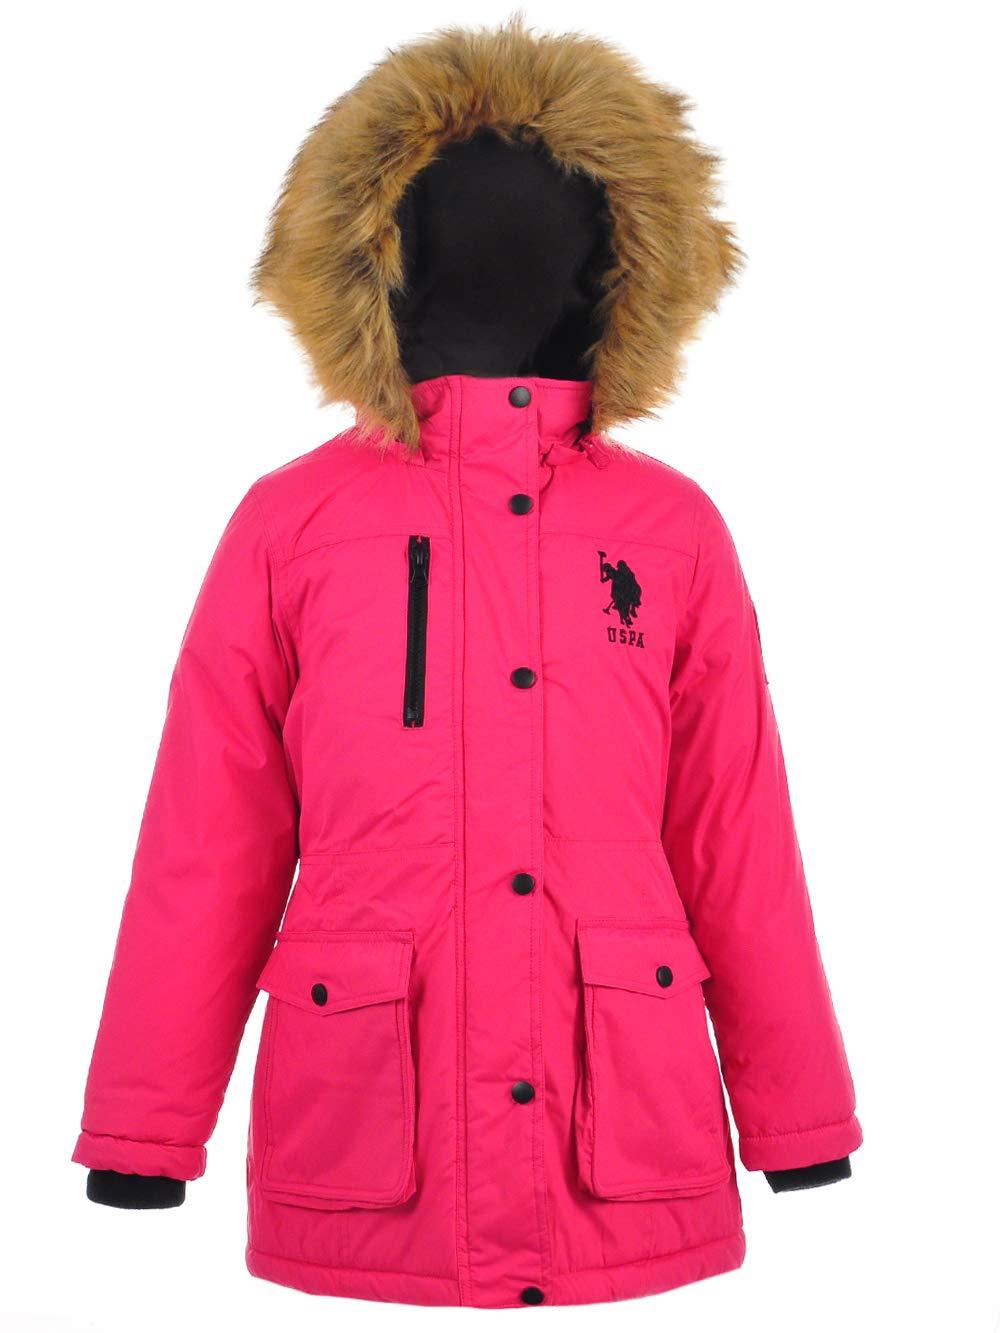 US Polo Association Girls' Big Parka Jacket with Faux Fur Hood, Fuchsia Purple, 10/12